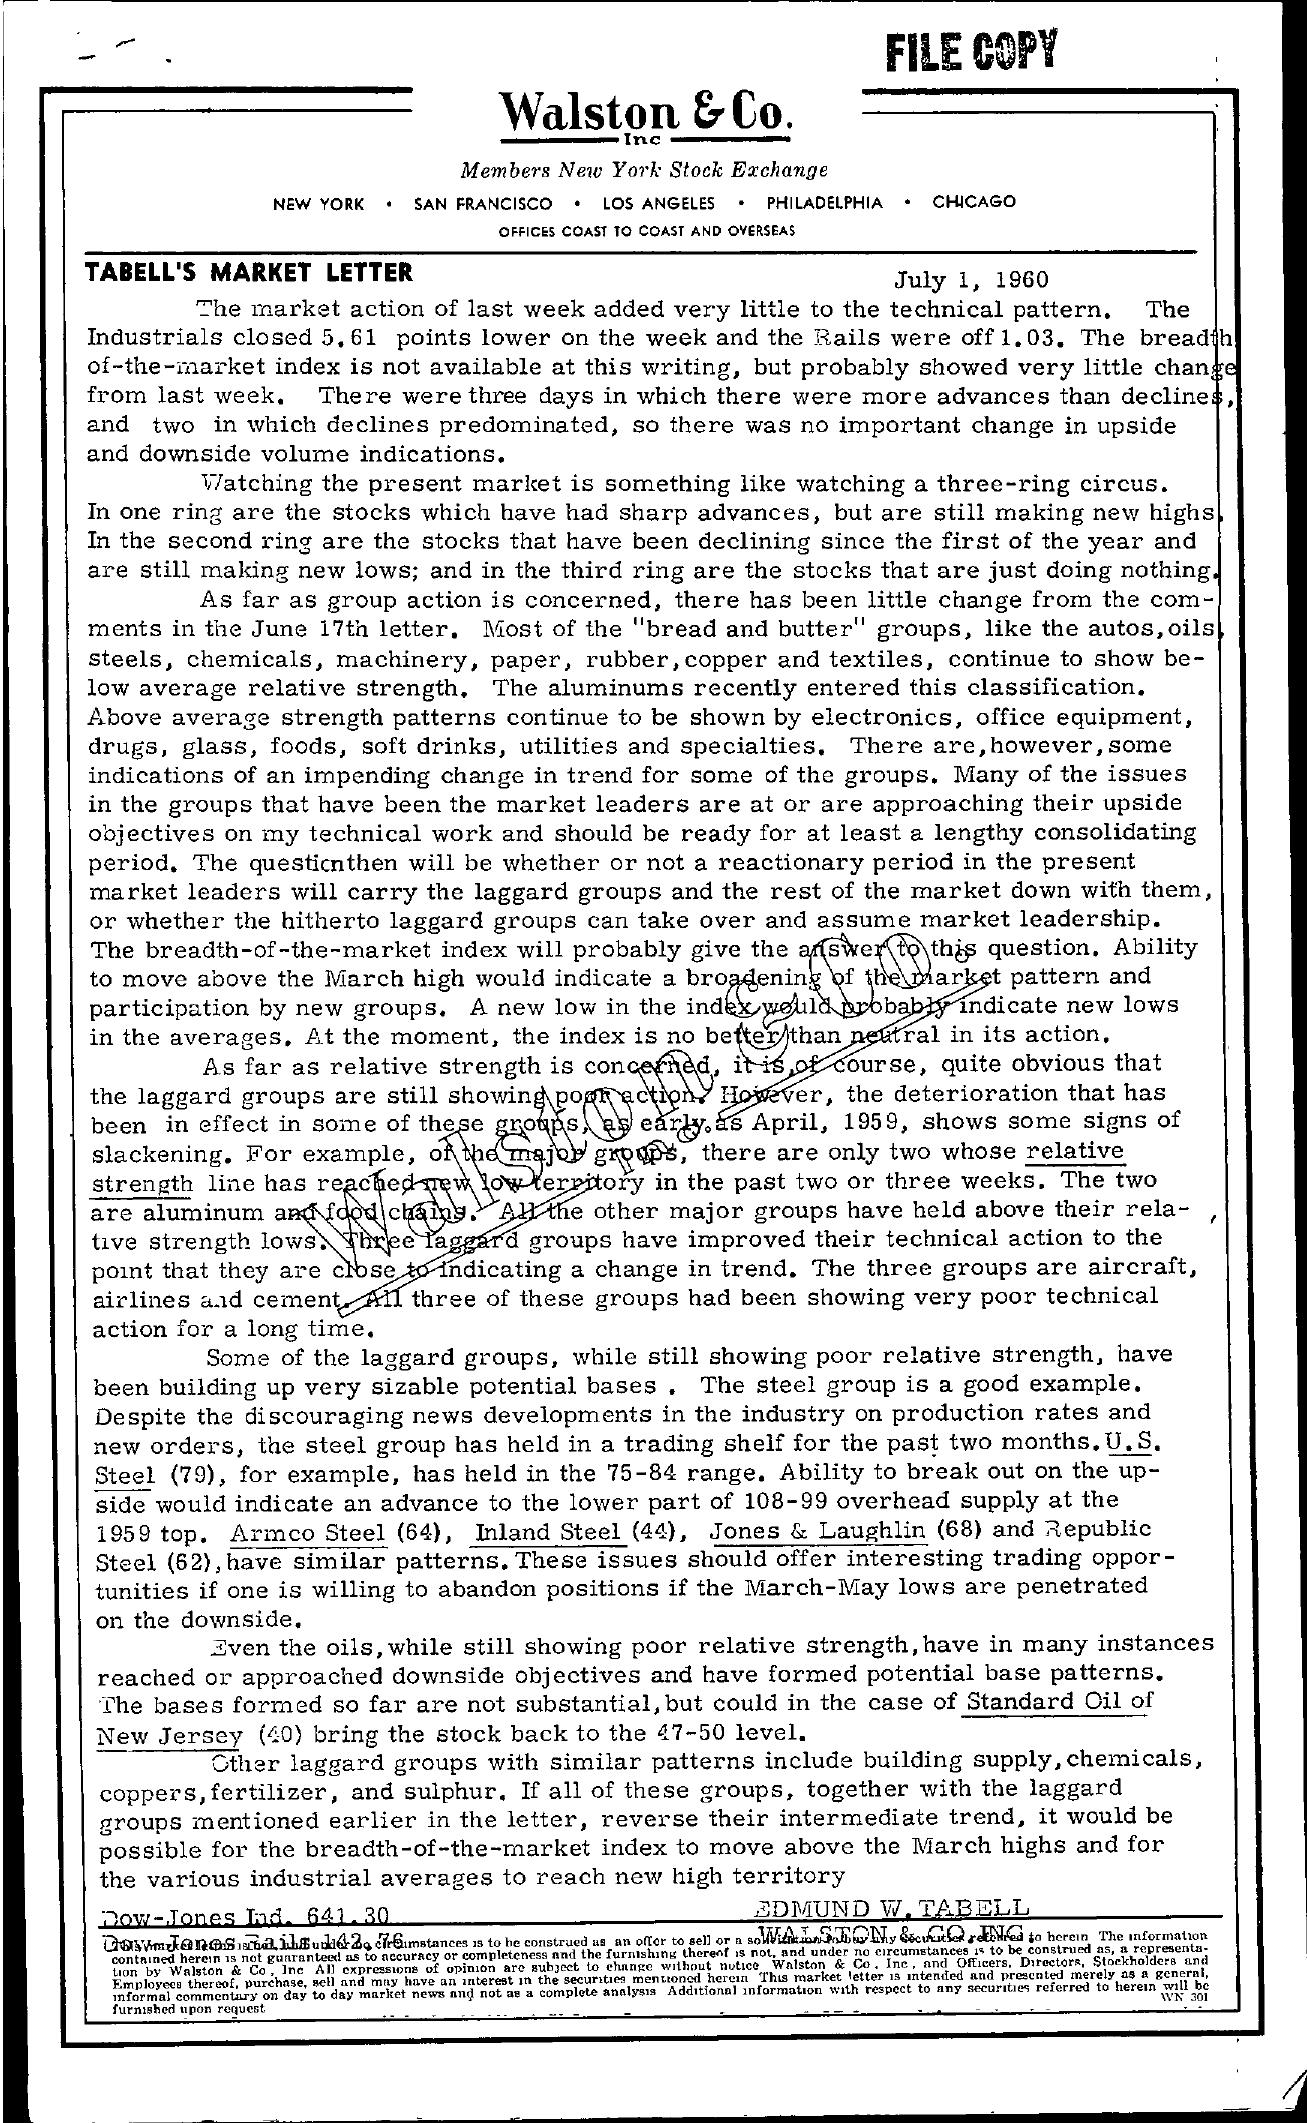 Tabell's Market Letter - July 01, 1960